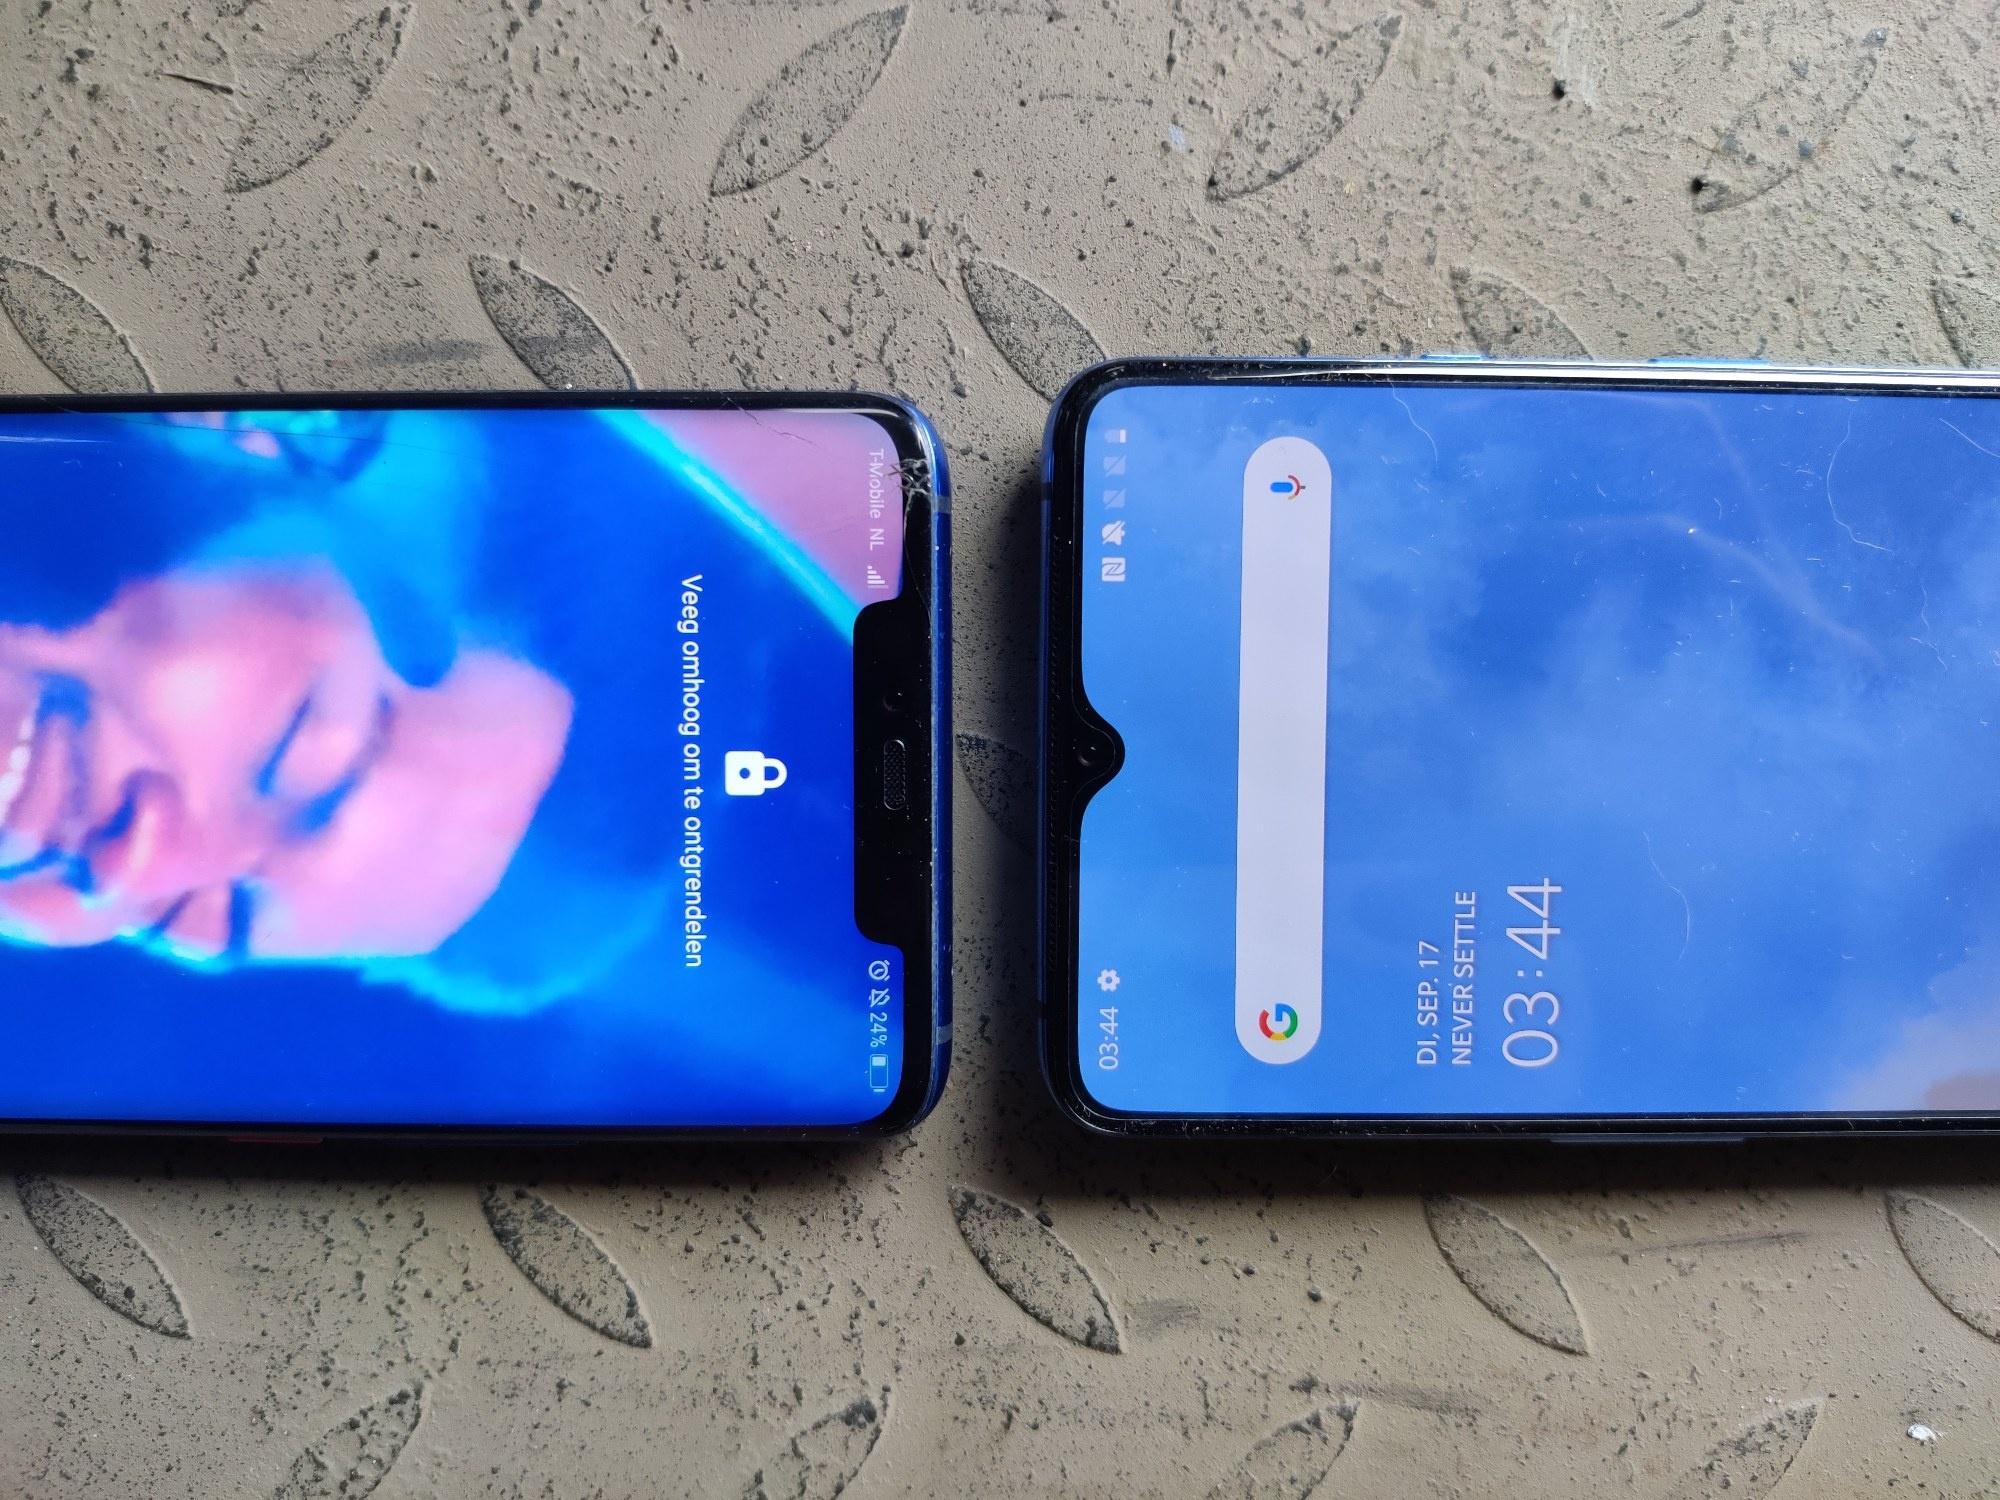 Huawei Mate 20 Pro vs OnePlus 7T